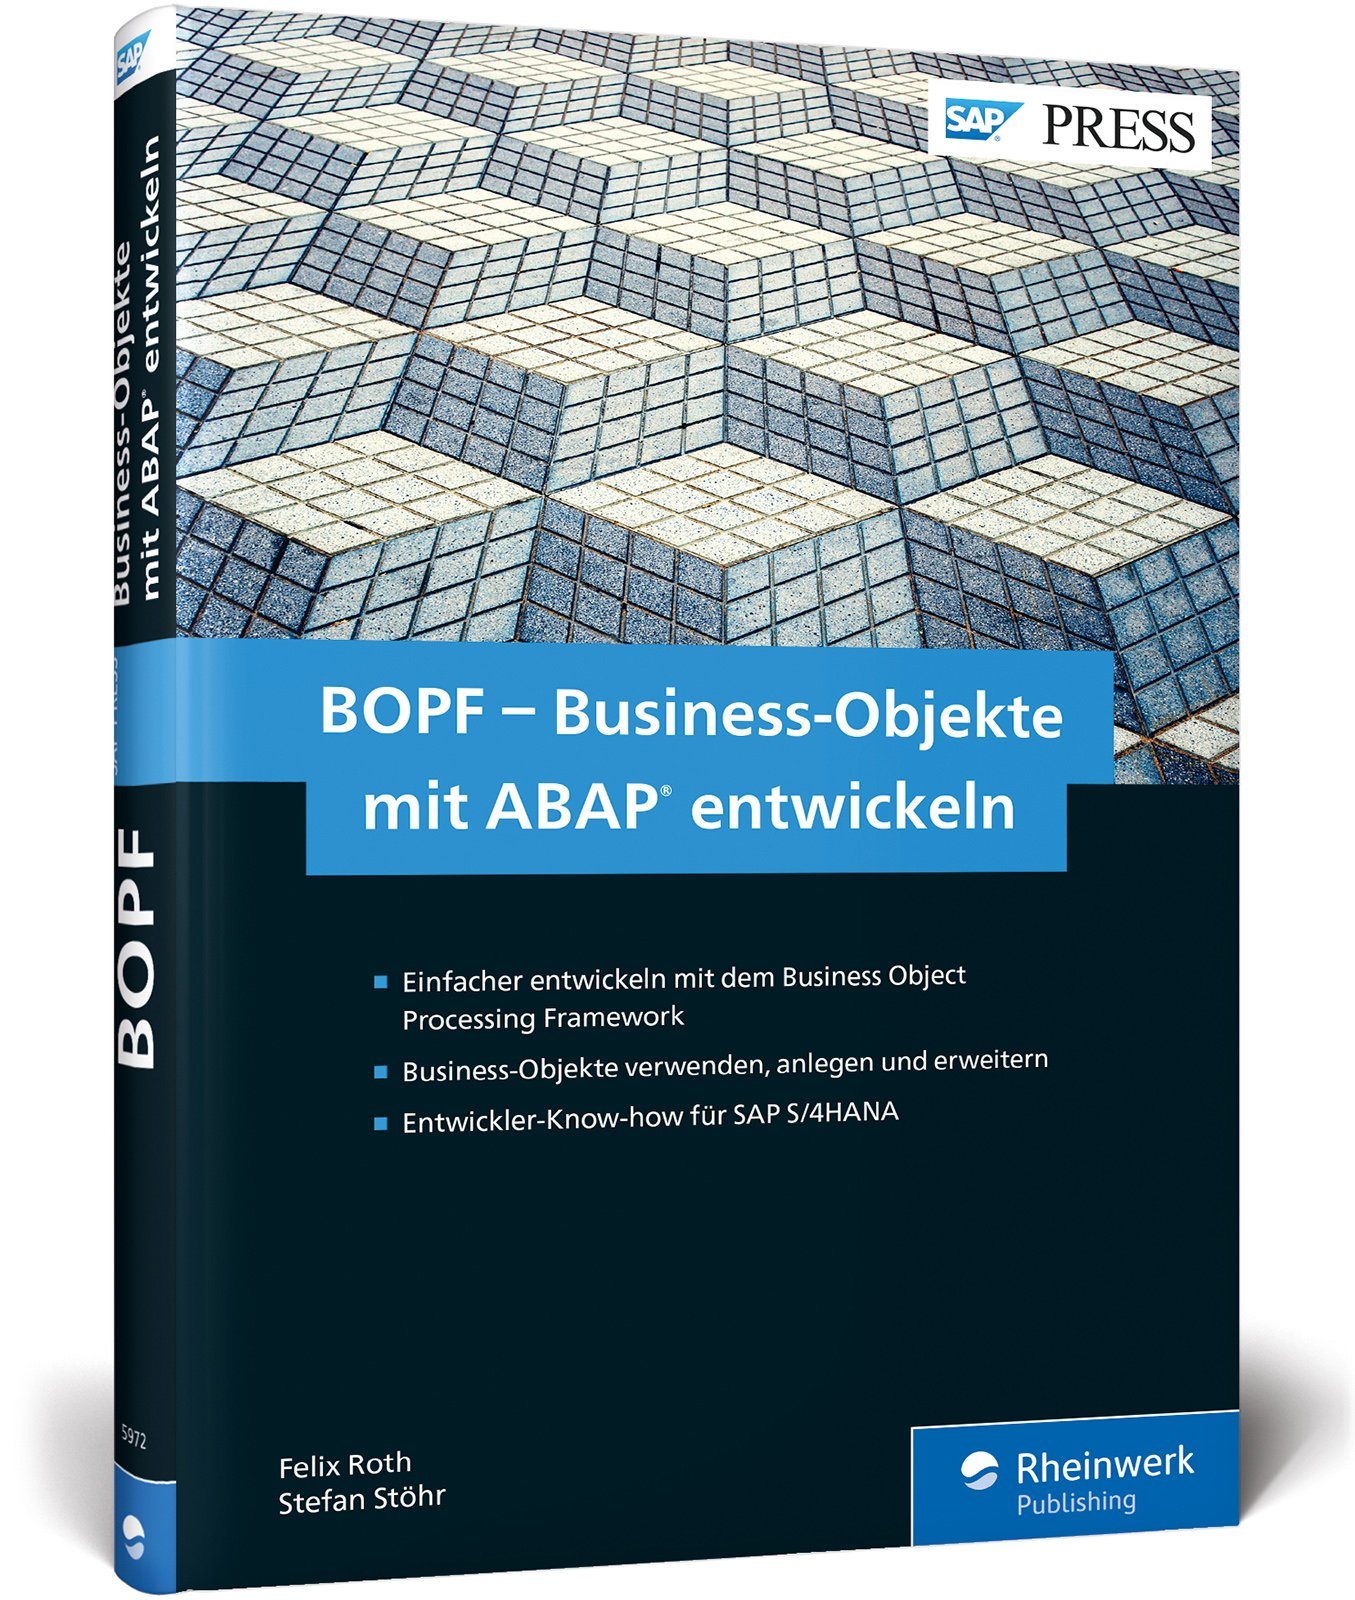 BOPF – Business-Objekte mit ABAP entwickeln: Das Business Object Processing Framework für das neue S/4HANA-Programmiermodell (SAP PRESS) Gebundenes Buch – 27. Dezember 2017 Felix Roth Stefan Stöhr 3836259729 COMPUTERS / General